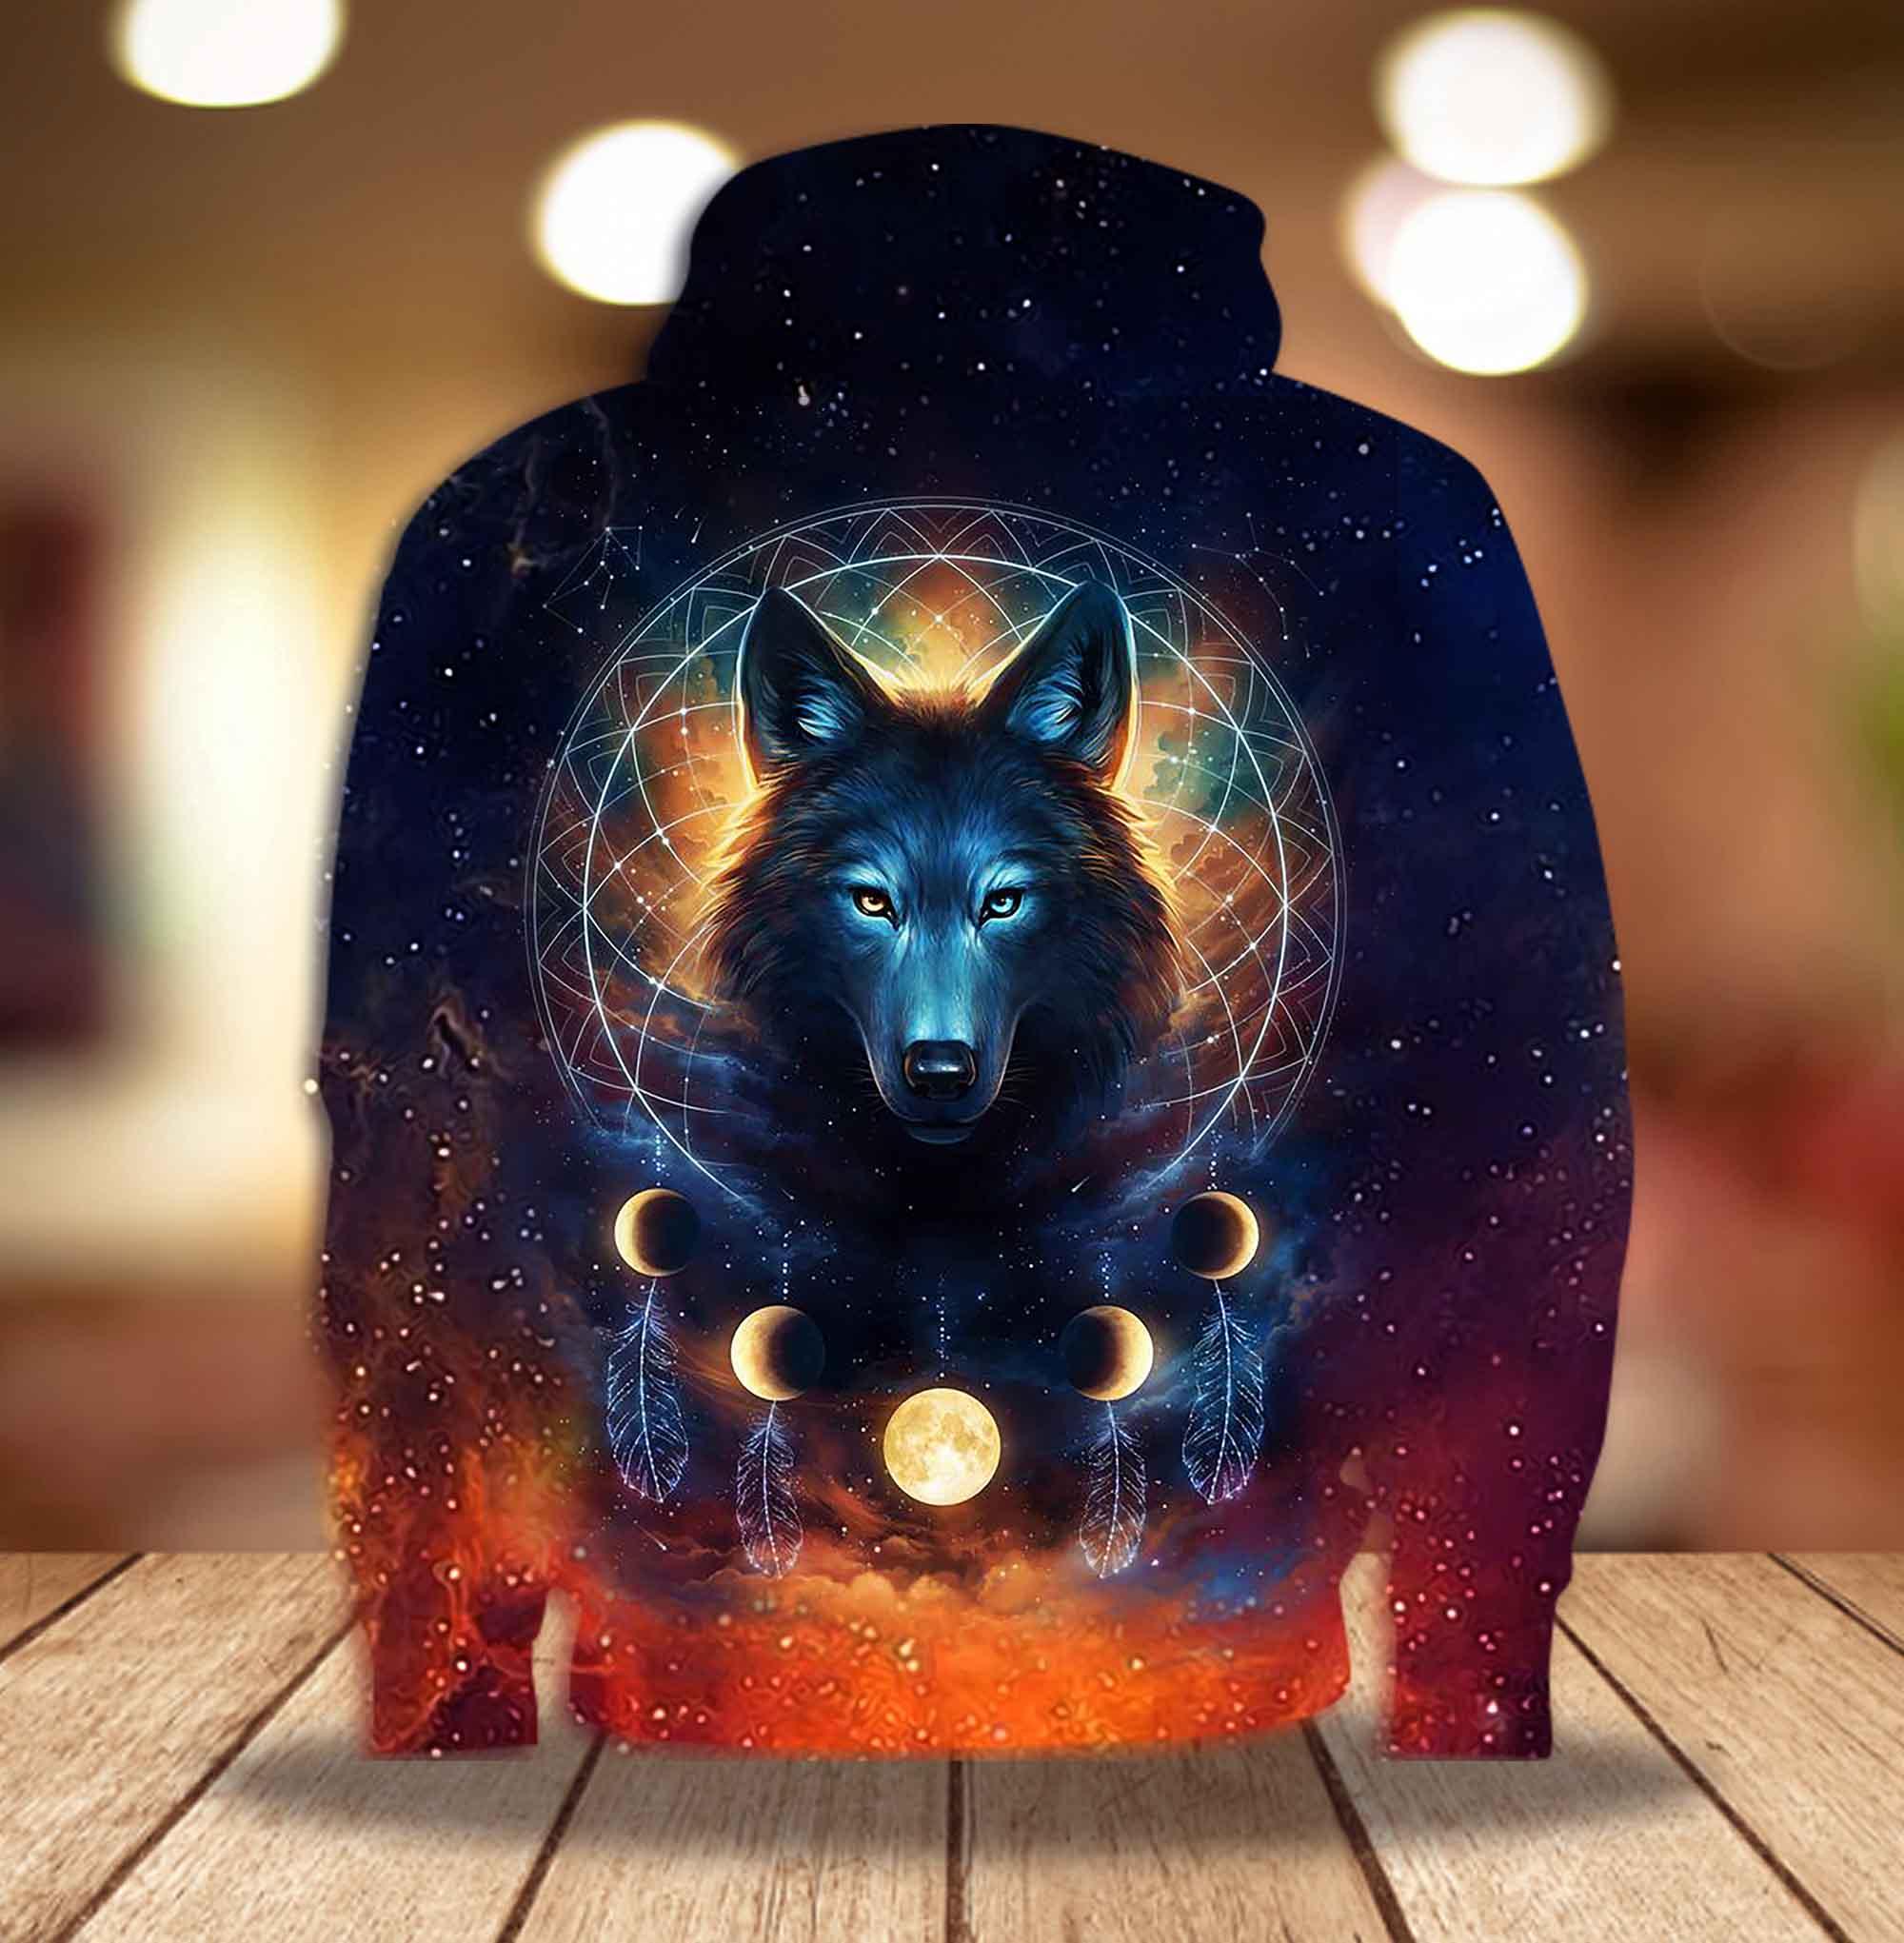 Mystery Wolf Dreamcatcher night star sky 3D Printed Hoodie T-shirt